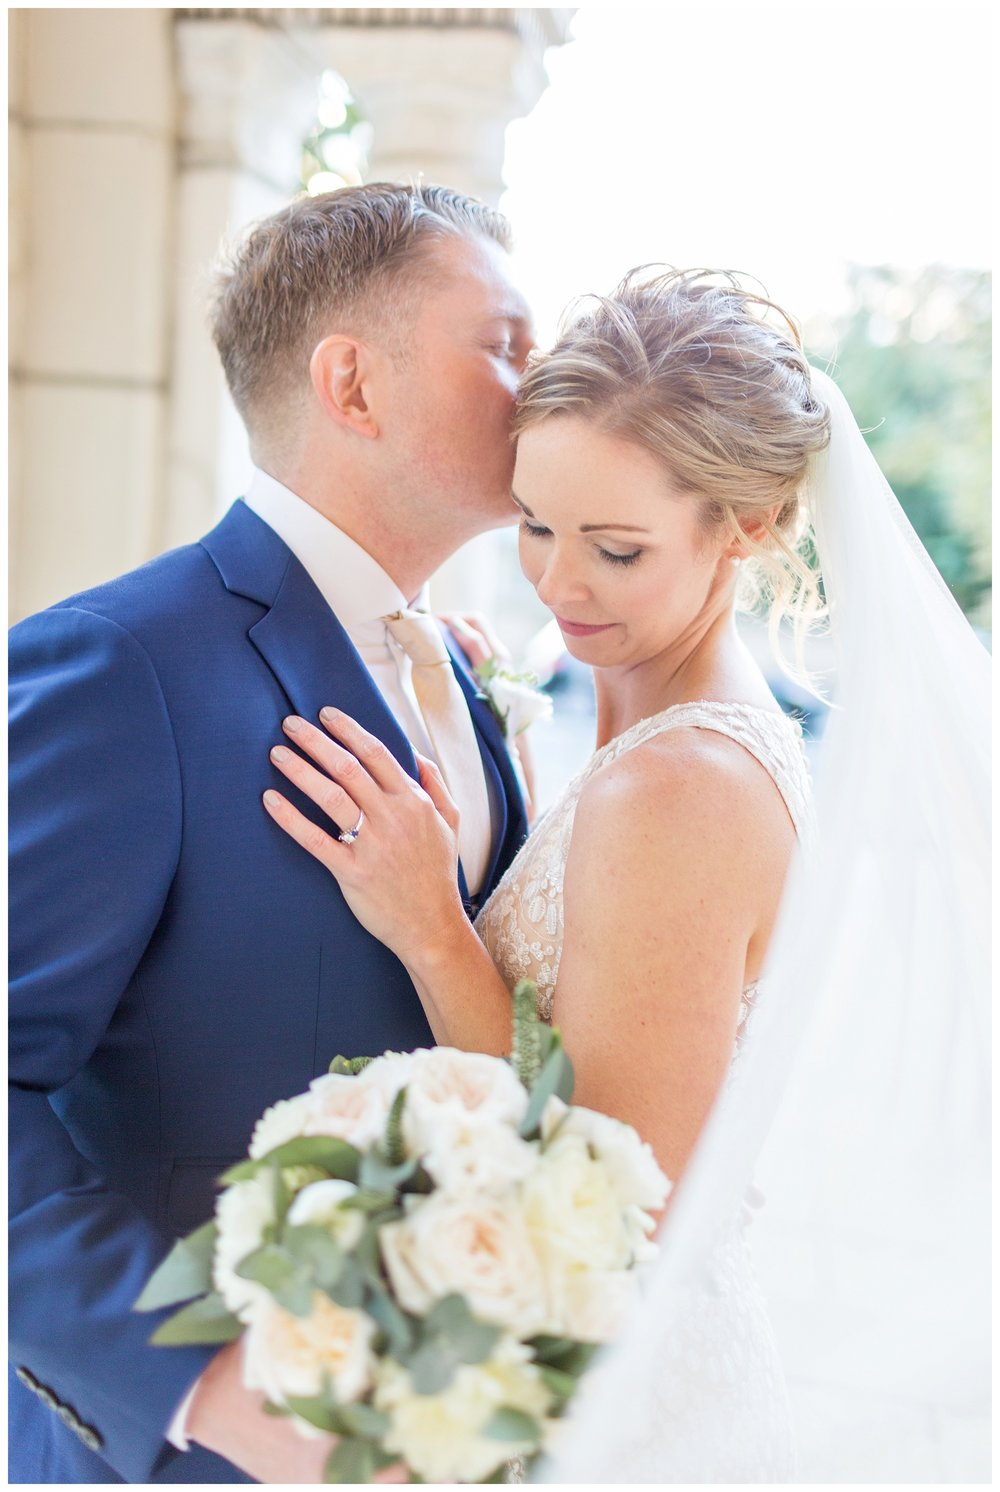 Meridian Hill Park Wedding | Washington DC Wedding Photographer Kir Tuben_0087.jpg